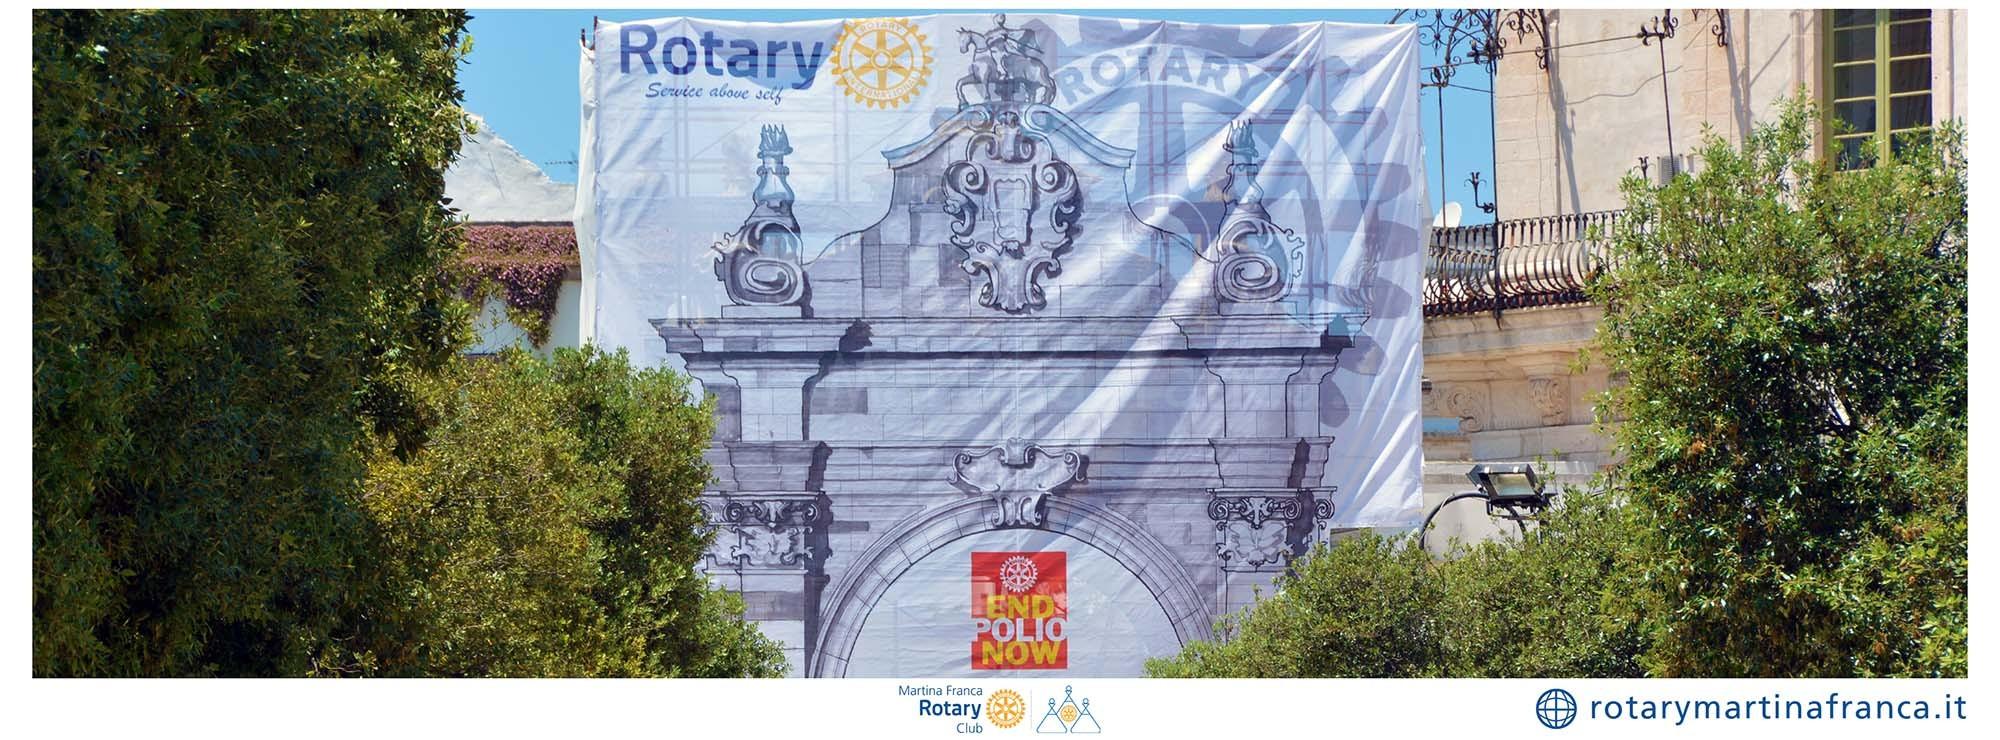 Rotary Club Martina Franca